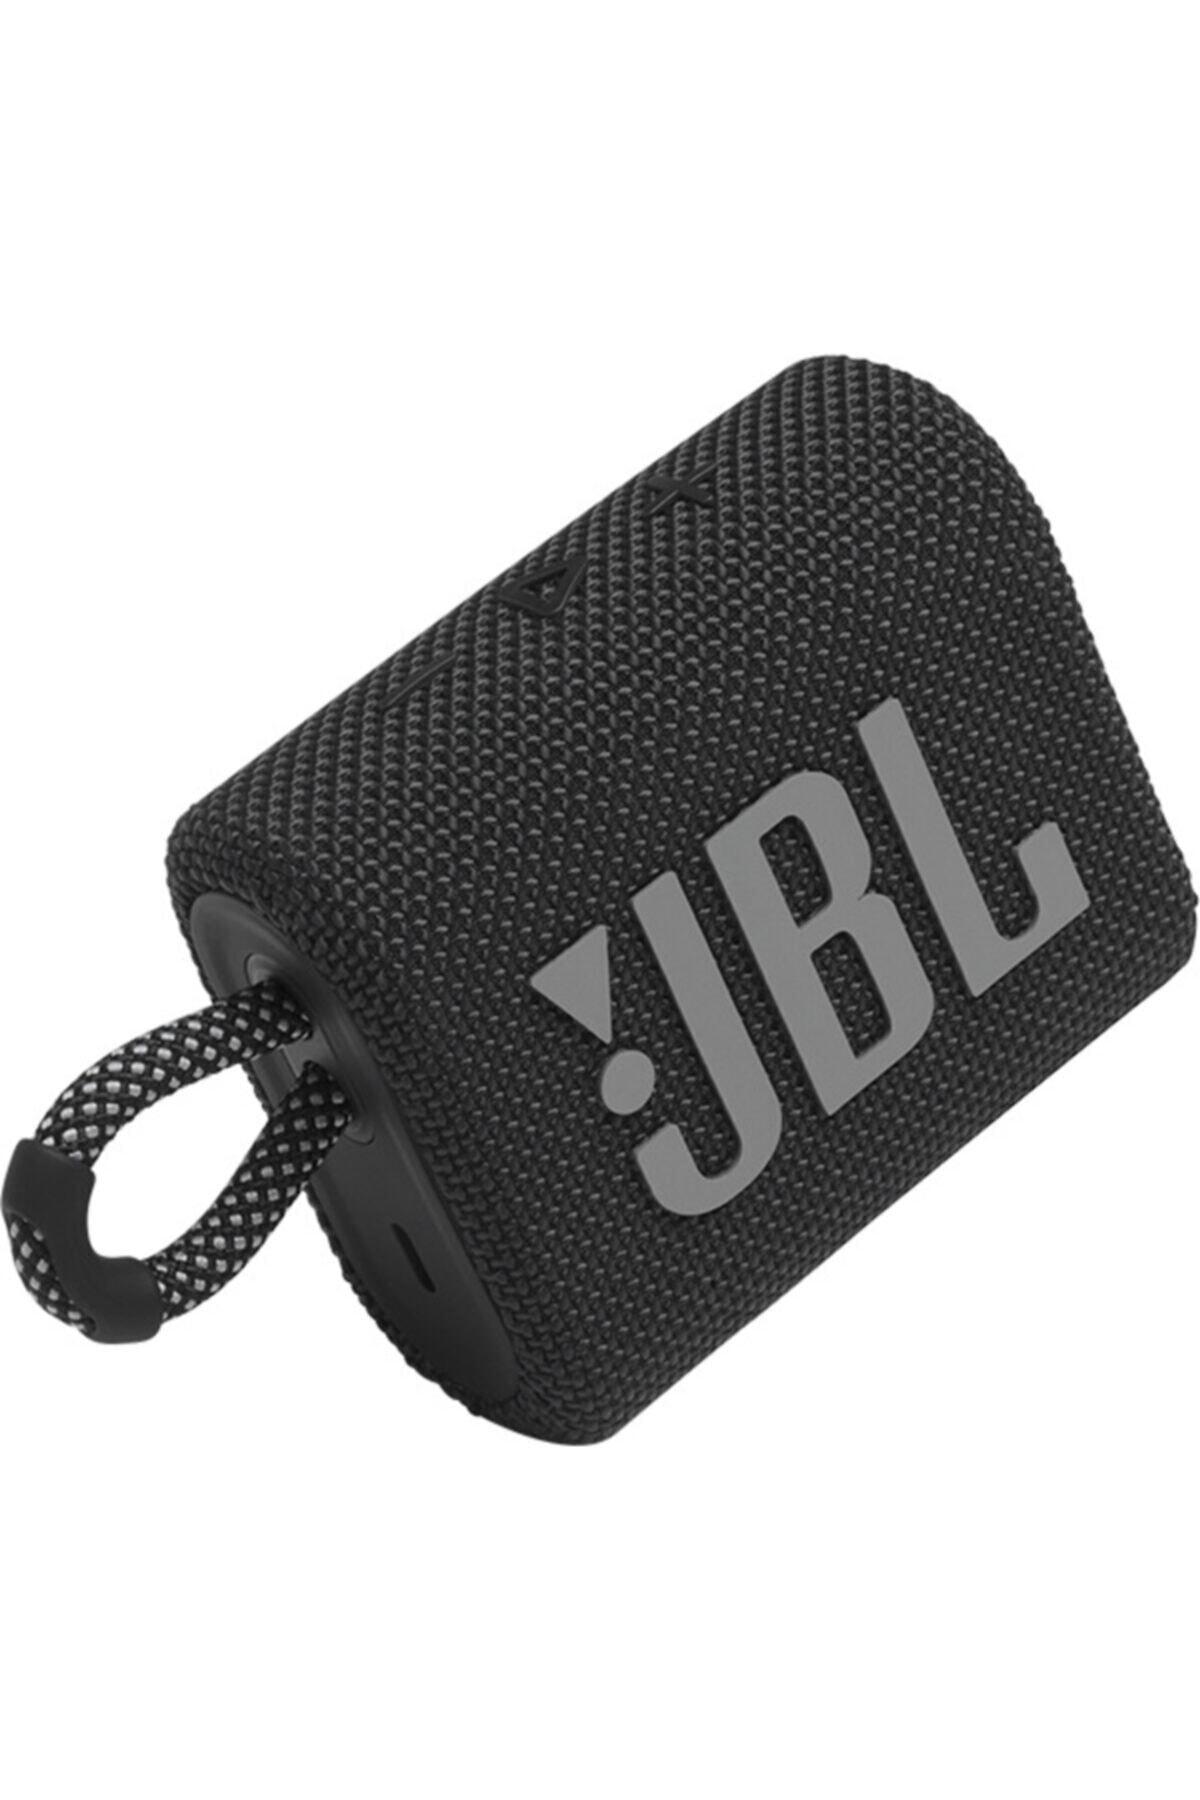 JBL Go 3 Siyah Bluetooth Hoparlör 1